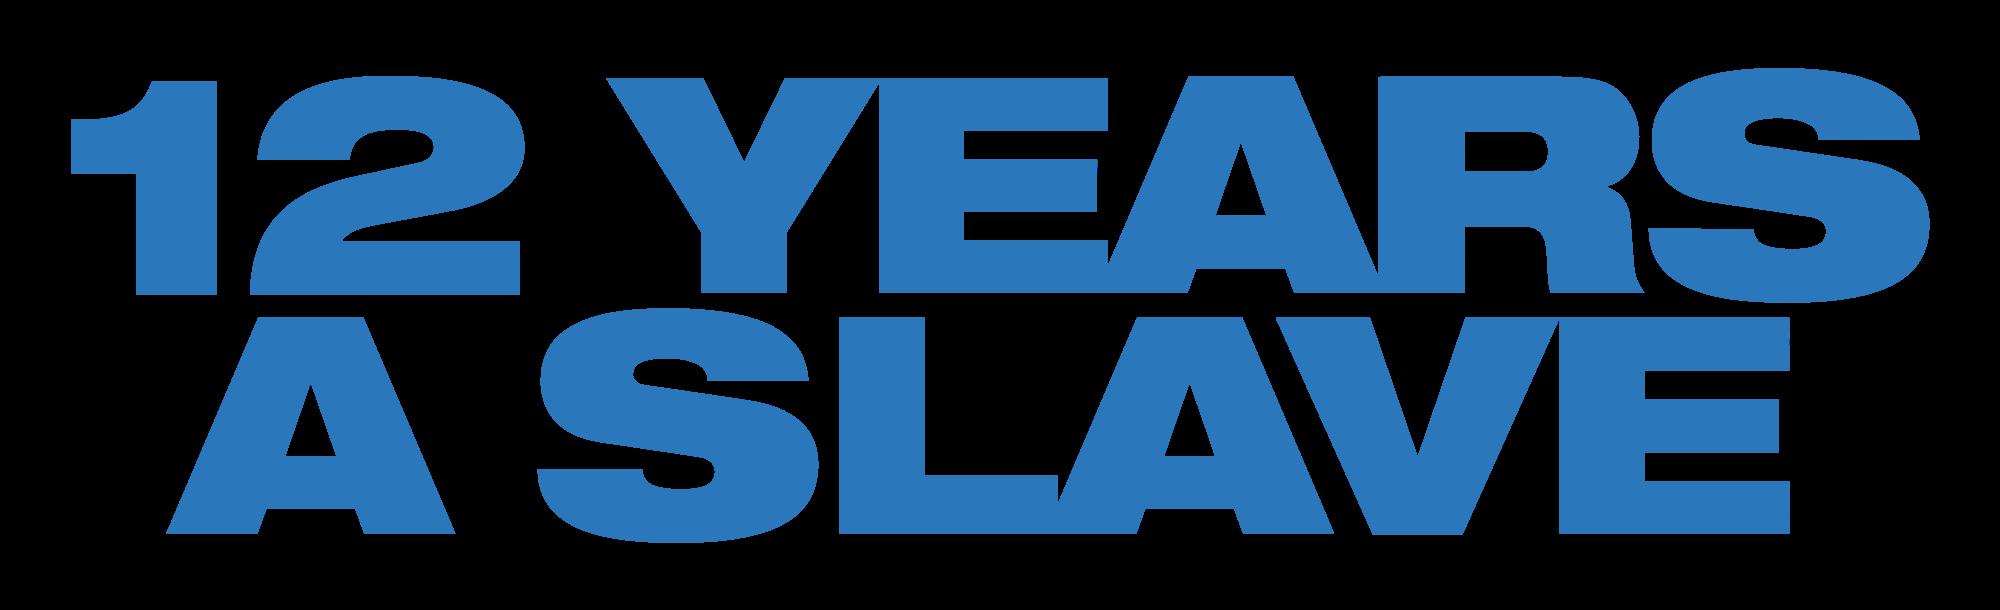 Slave svg #15, Download drawings